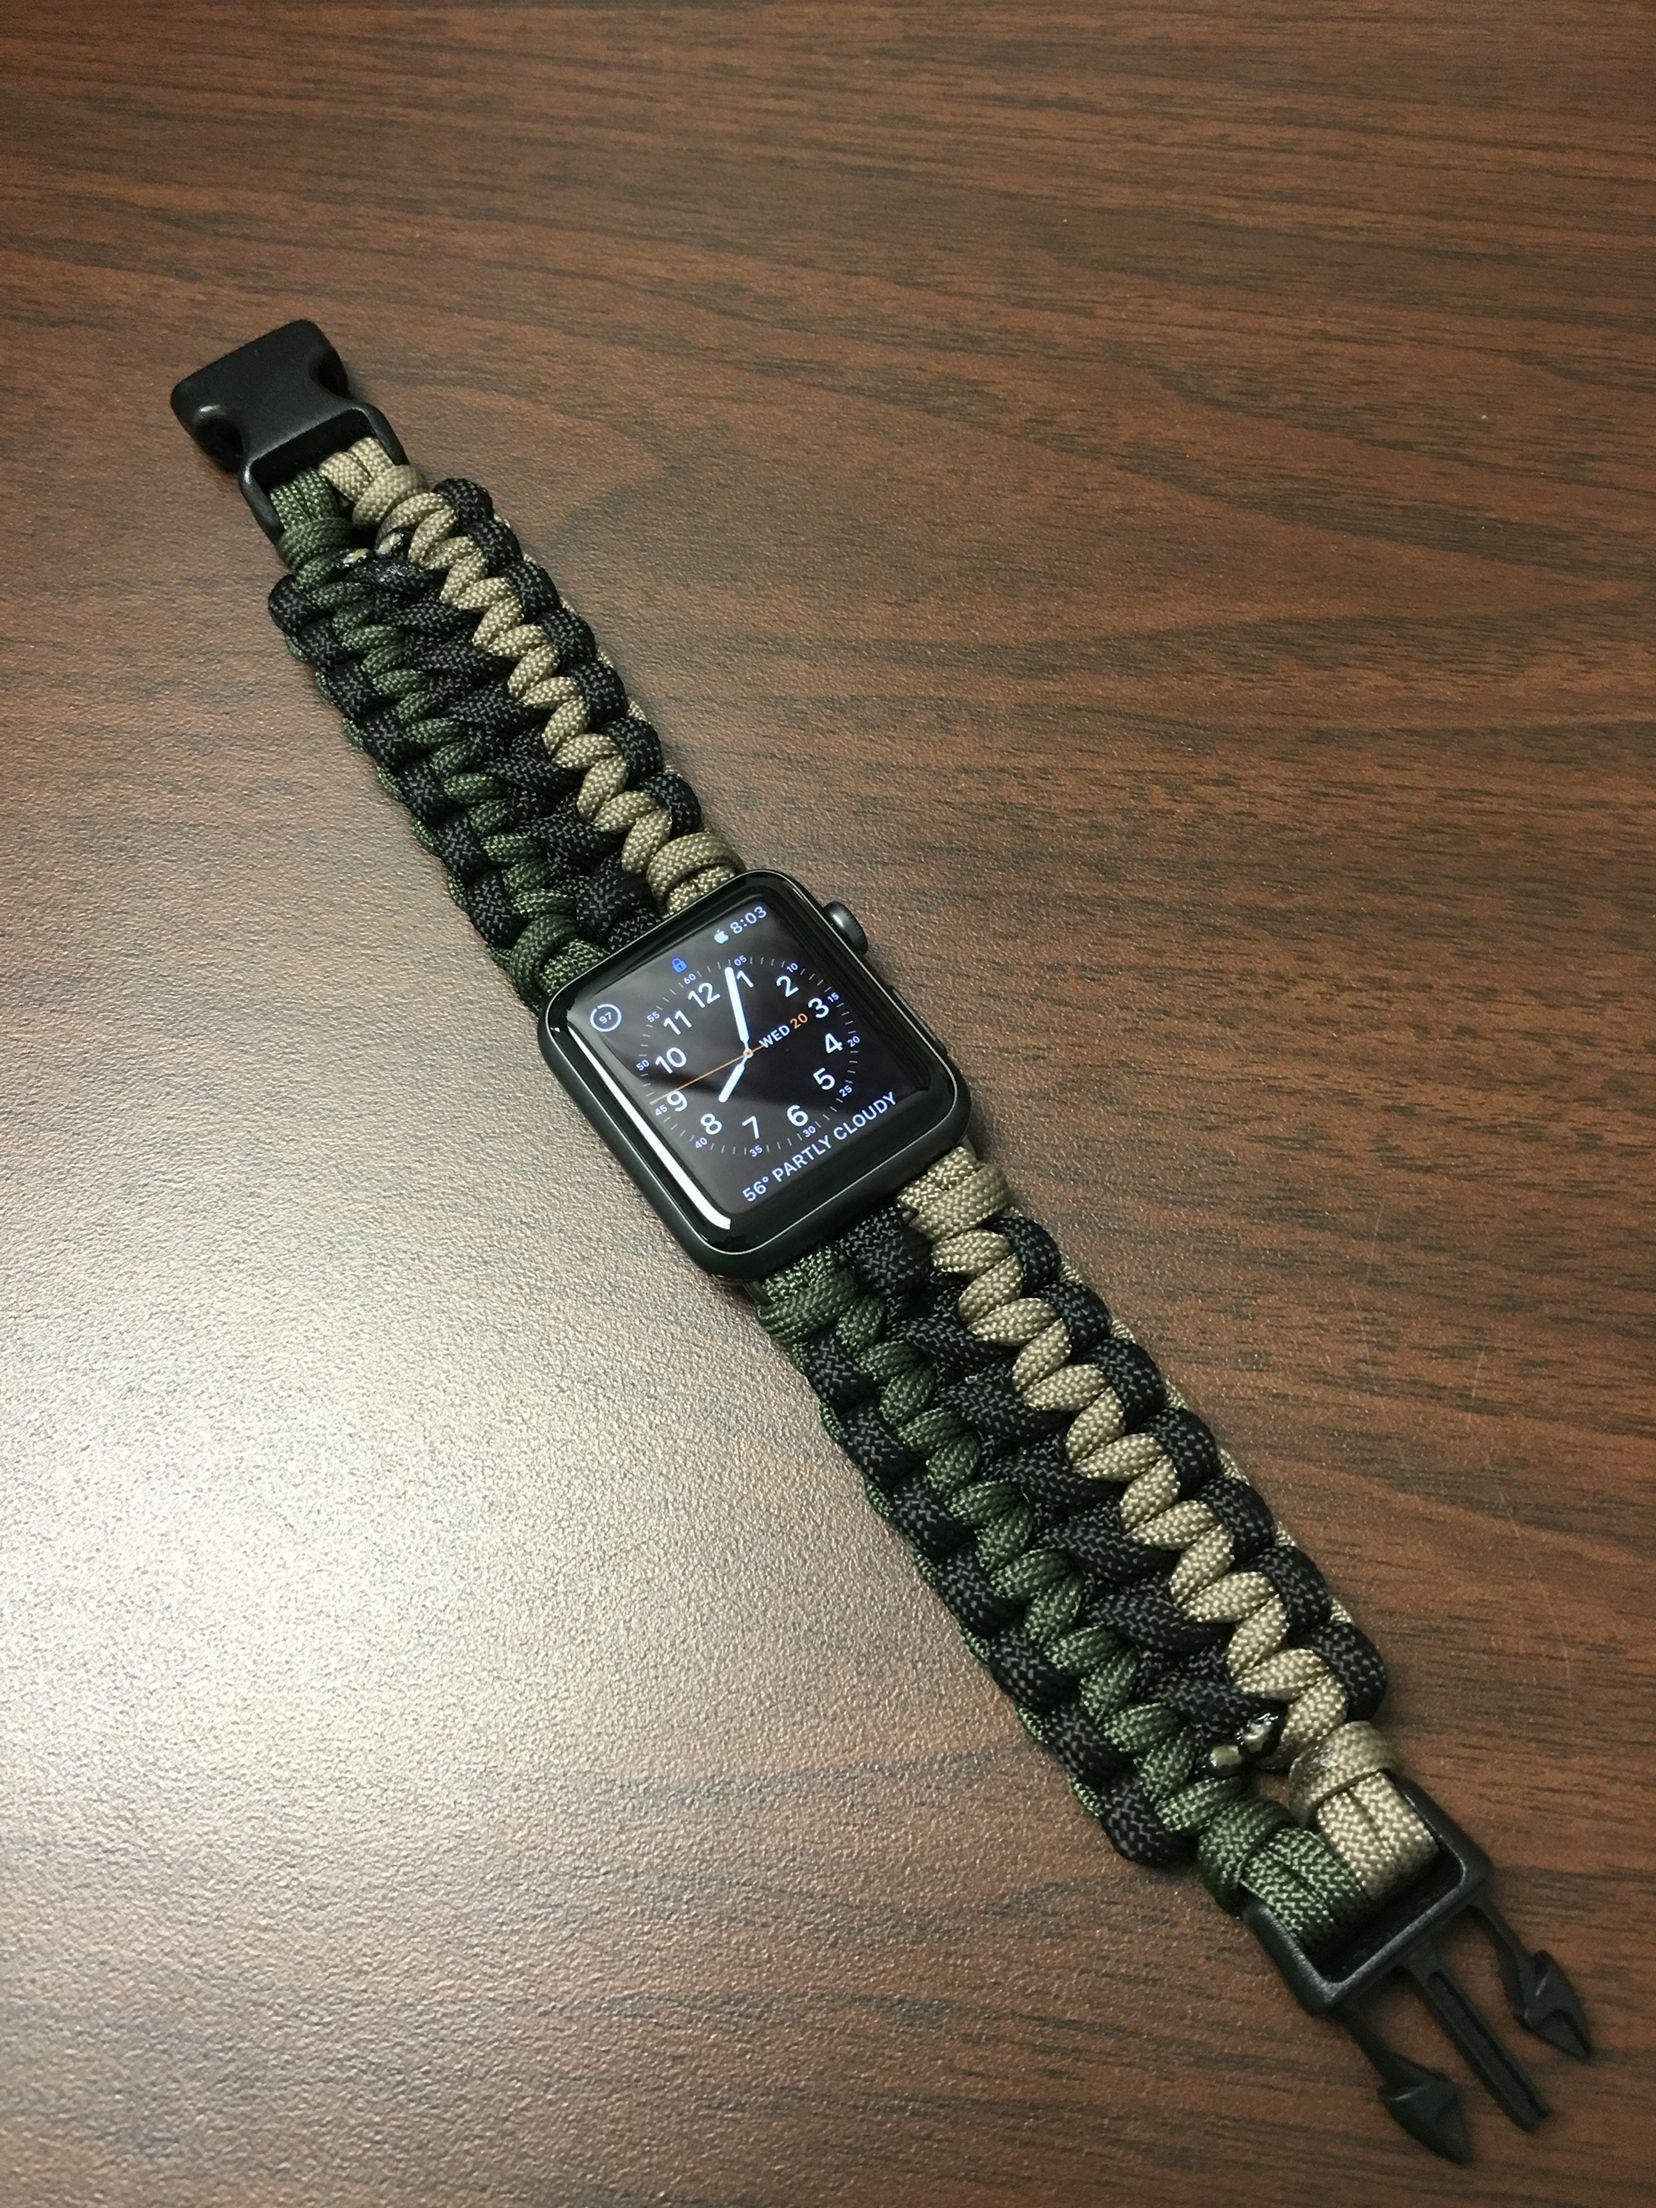 Apple Watch Band Paracord Watch Paracord Bracelet Diy Apple